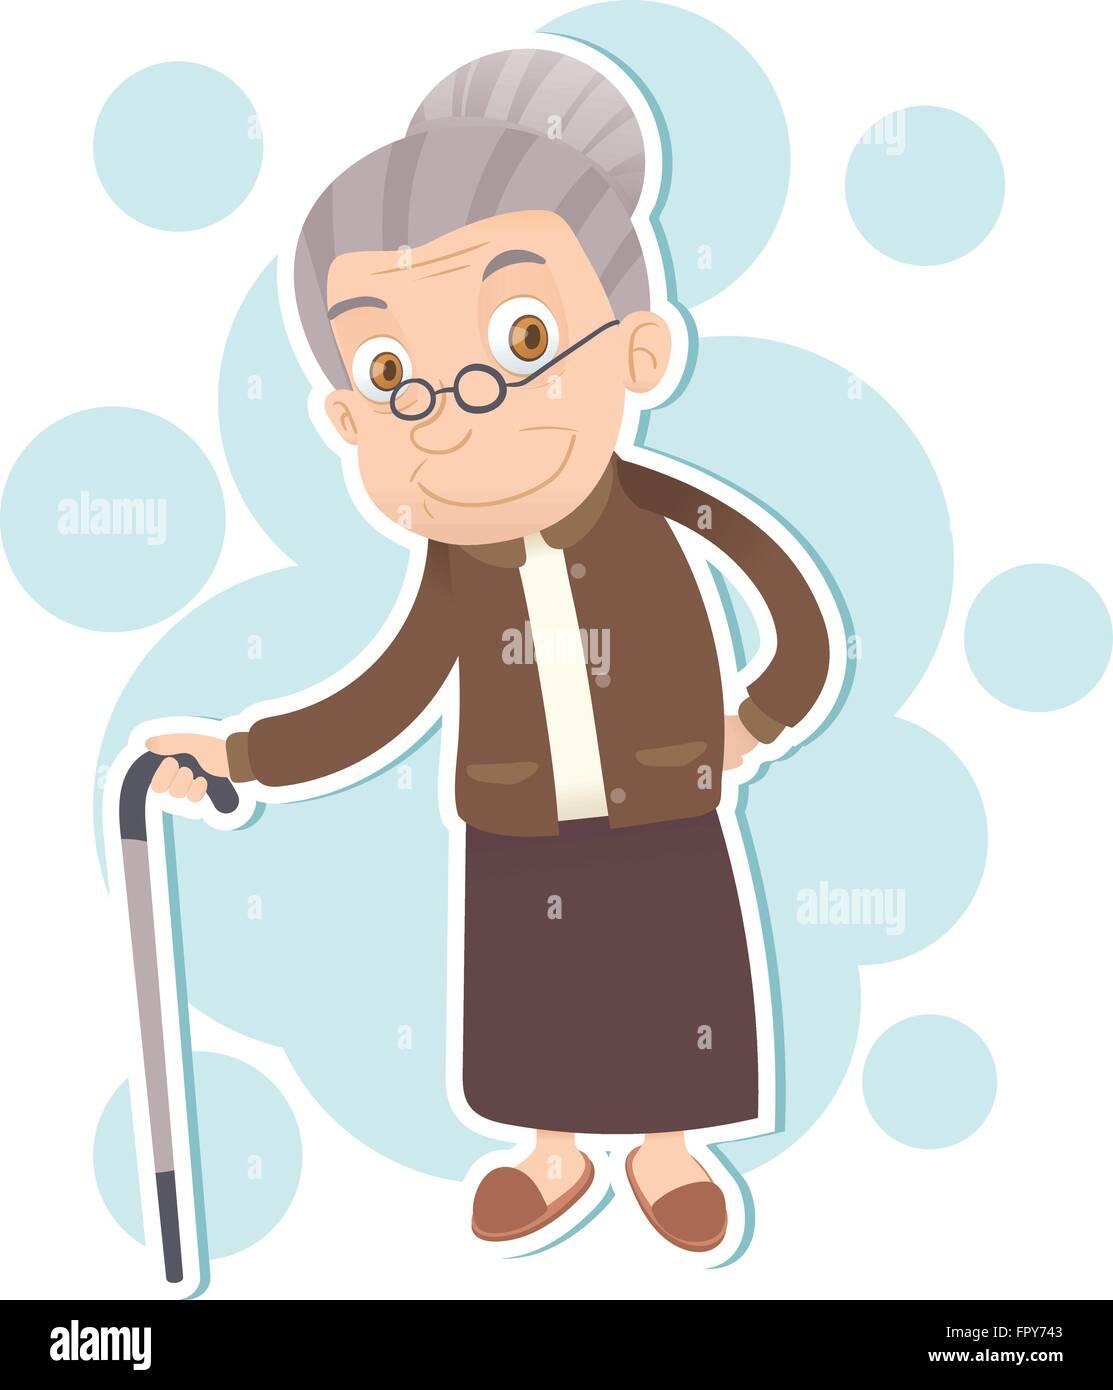 cartoon old lady stock photos cartoon old lady stock images alamy rh alamy com cartoon old woman face cartoon old woman face